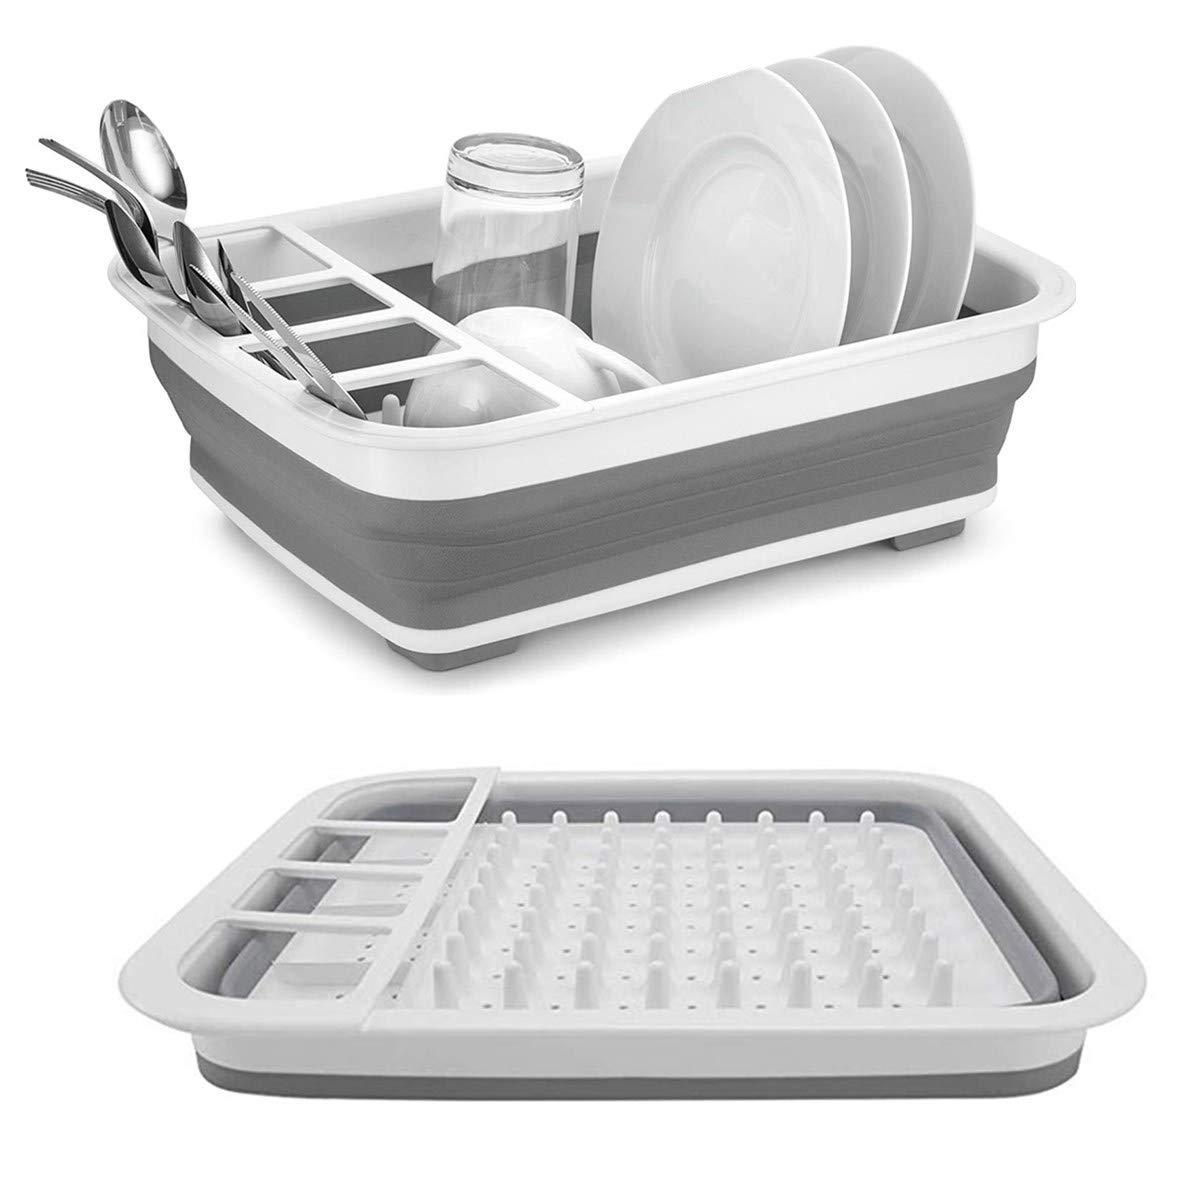 Collapsible Drying Dish Storage Rack Portable Dinnerware Organizer Space Saving Kitchen